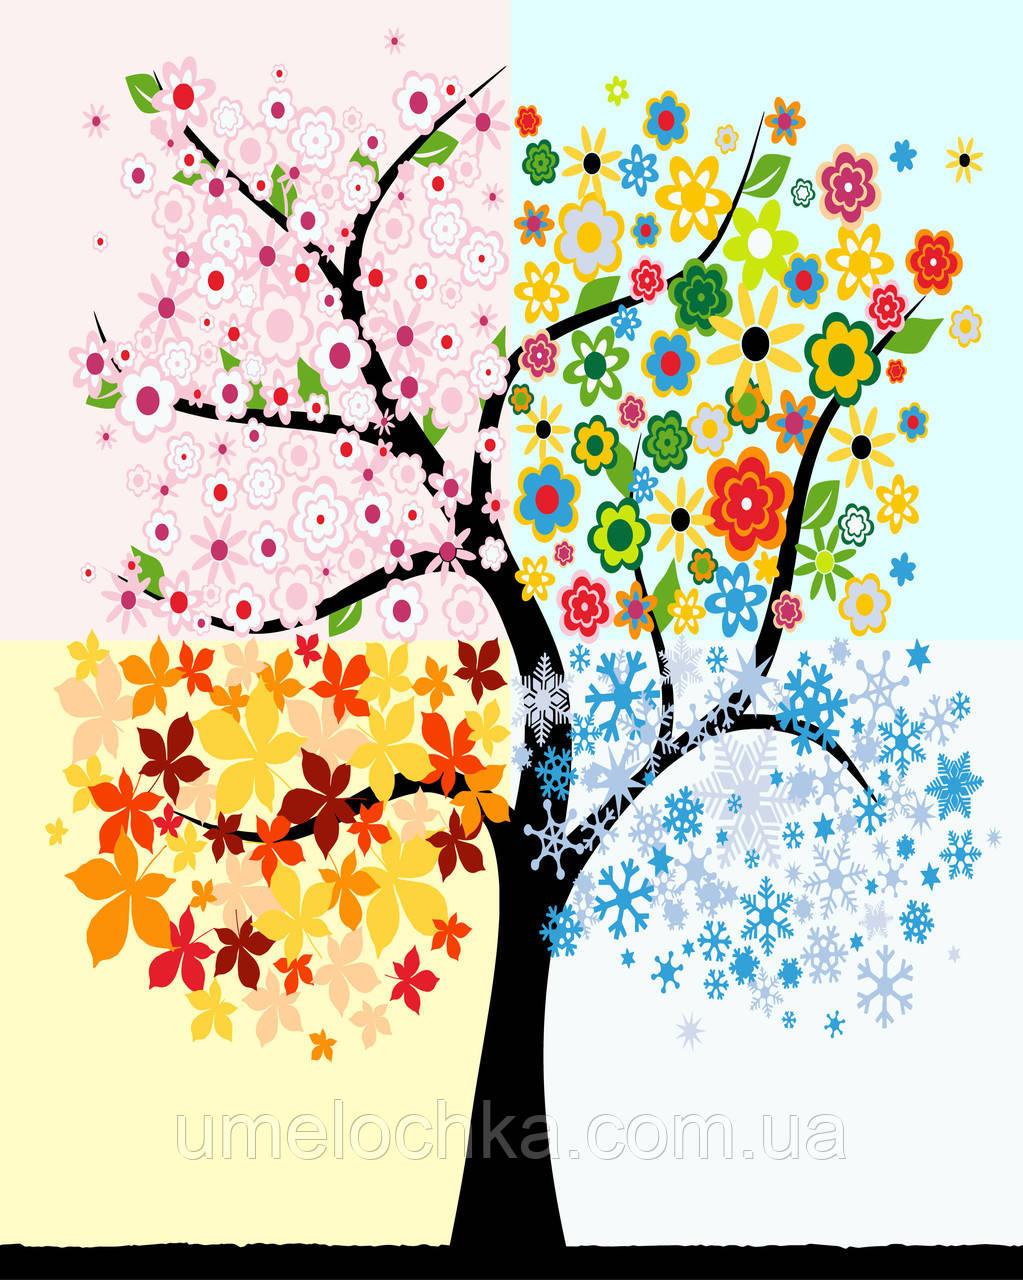 Рисование по номерам Дерево времен года (BRM-GX7459) 40 х 50 см